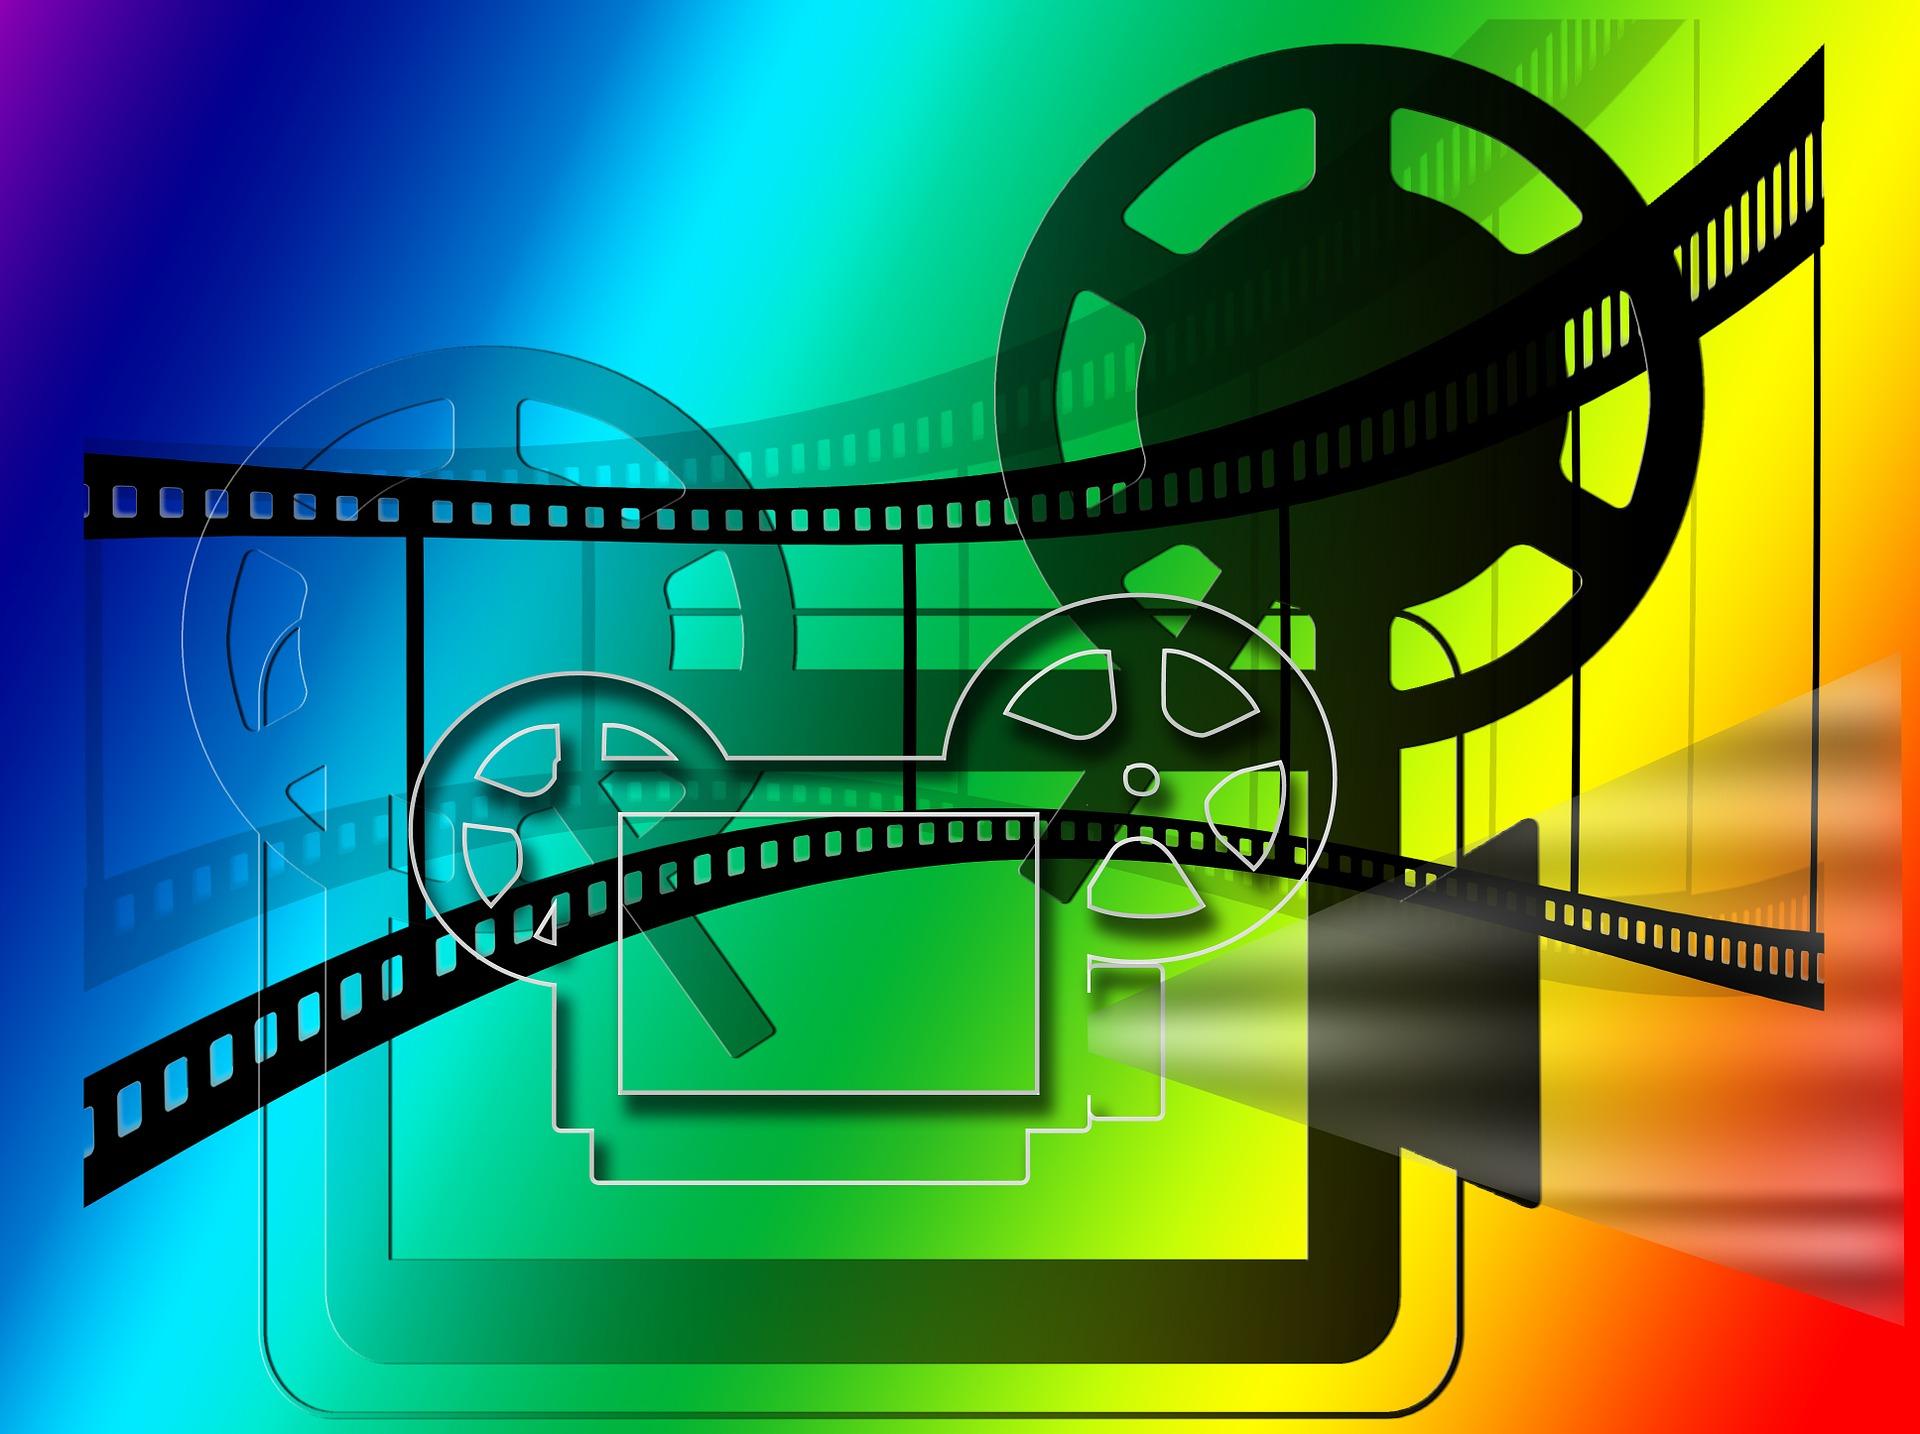 Cinema, sociedade e urbanismo